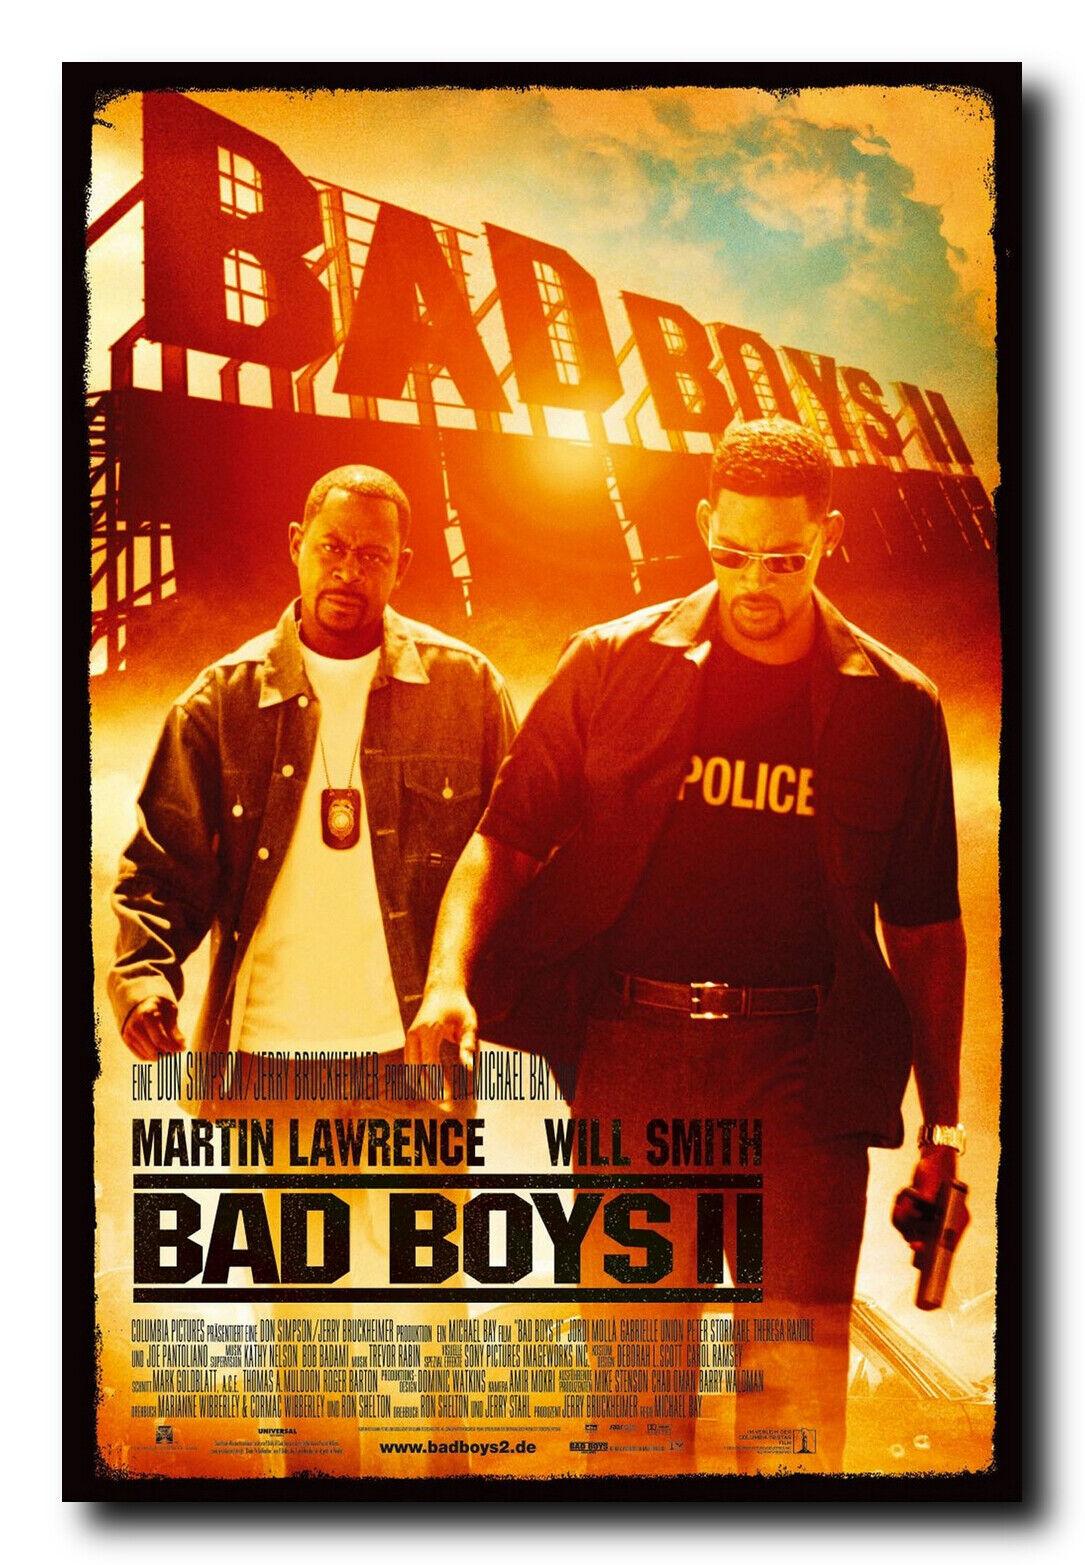 Bad Boys II Movie Poster 24x36 Inch Wall Art Print - Will Sm